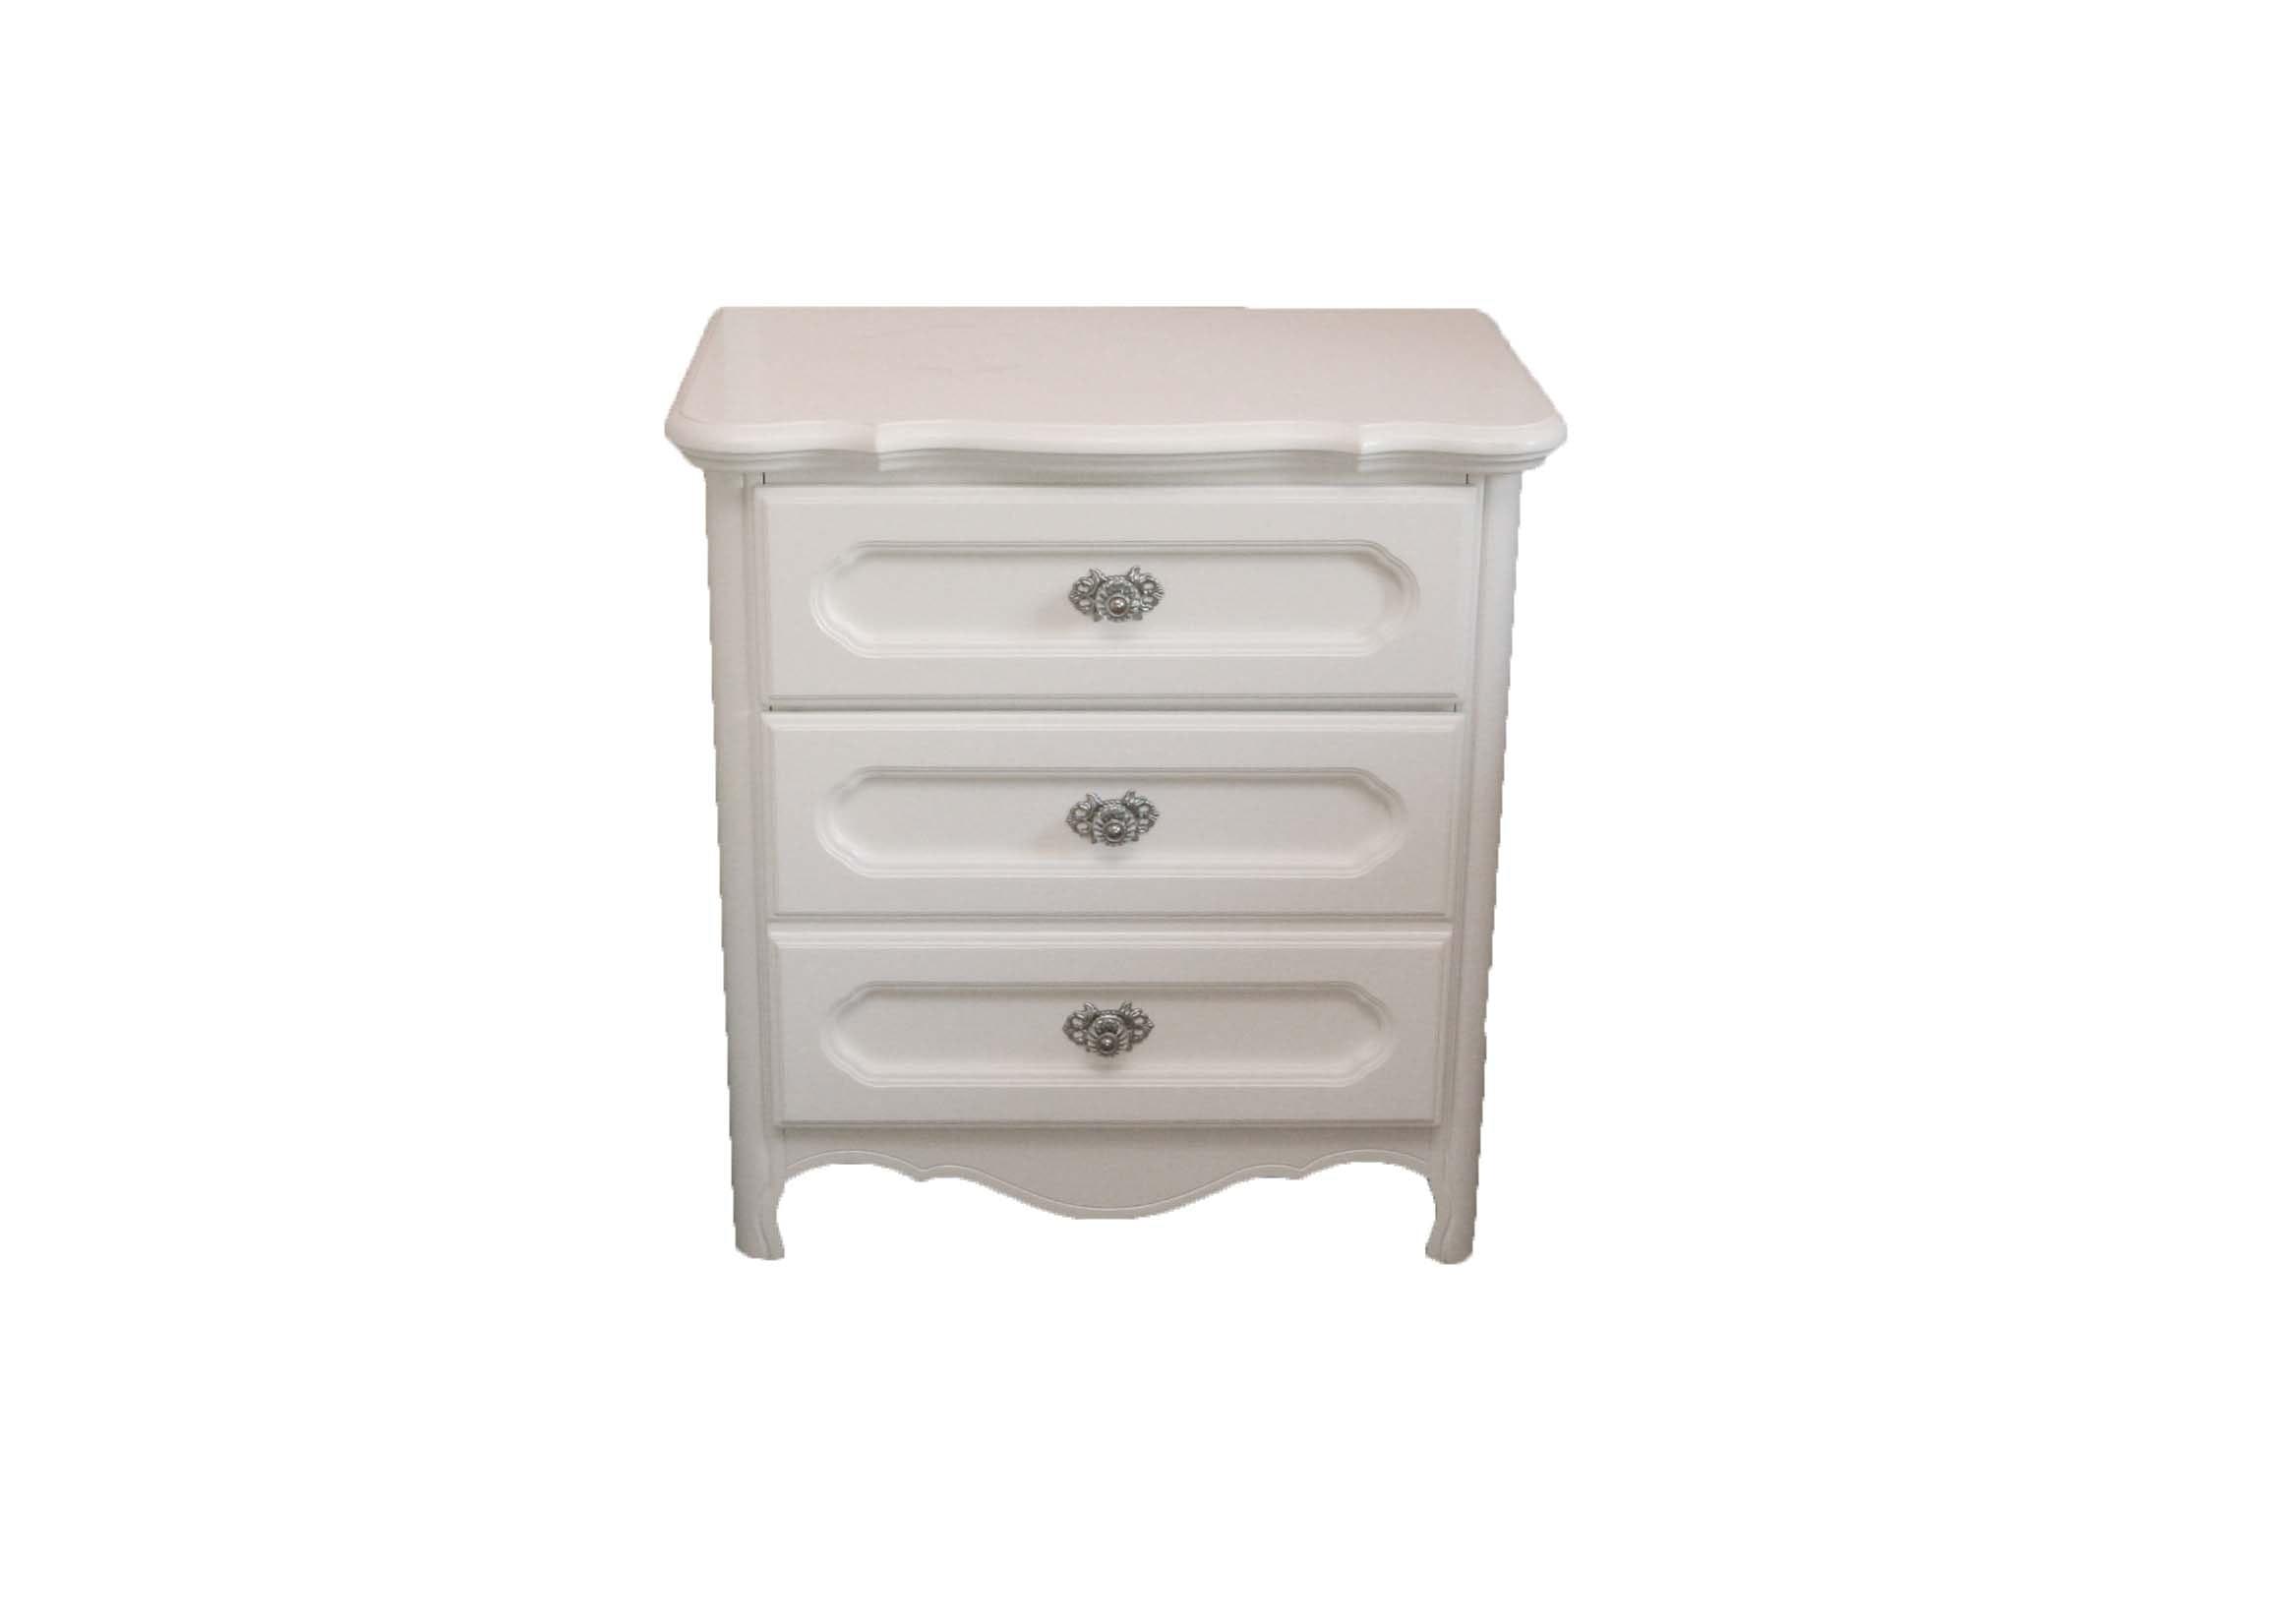 White Wooden Nightstand